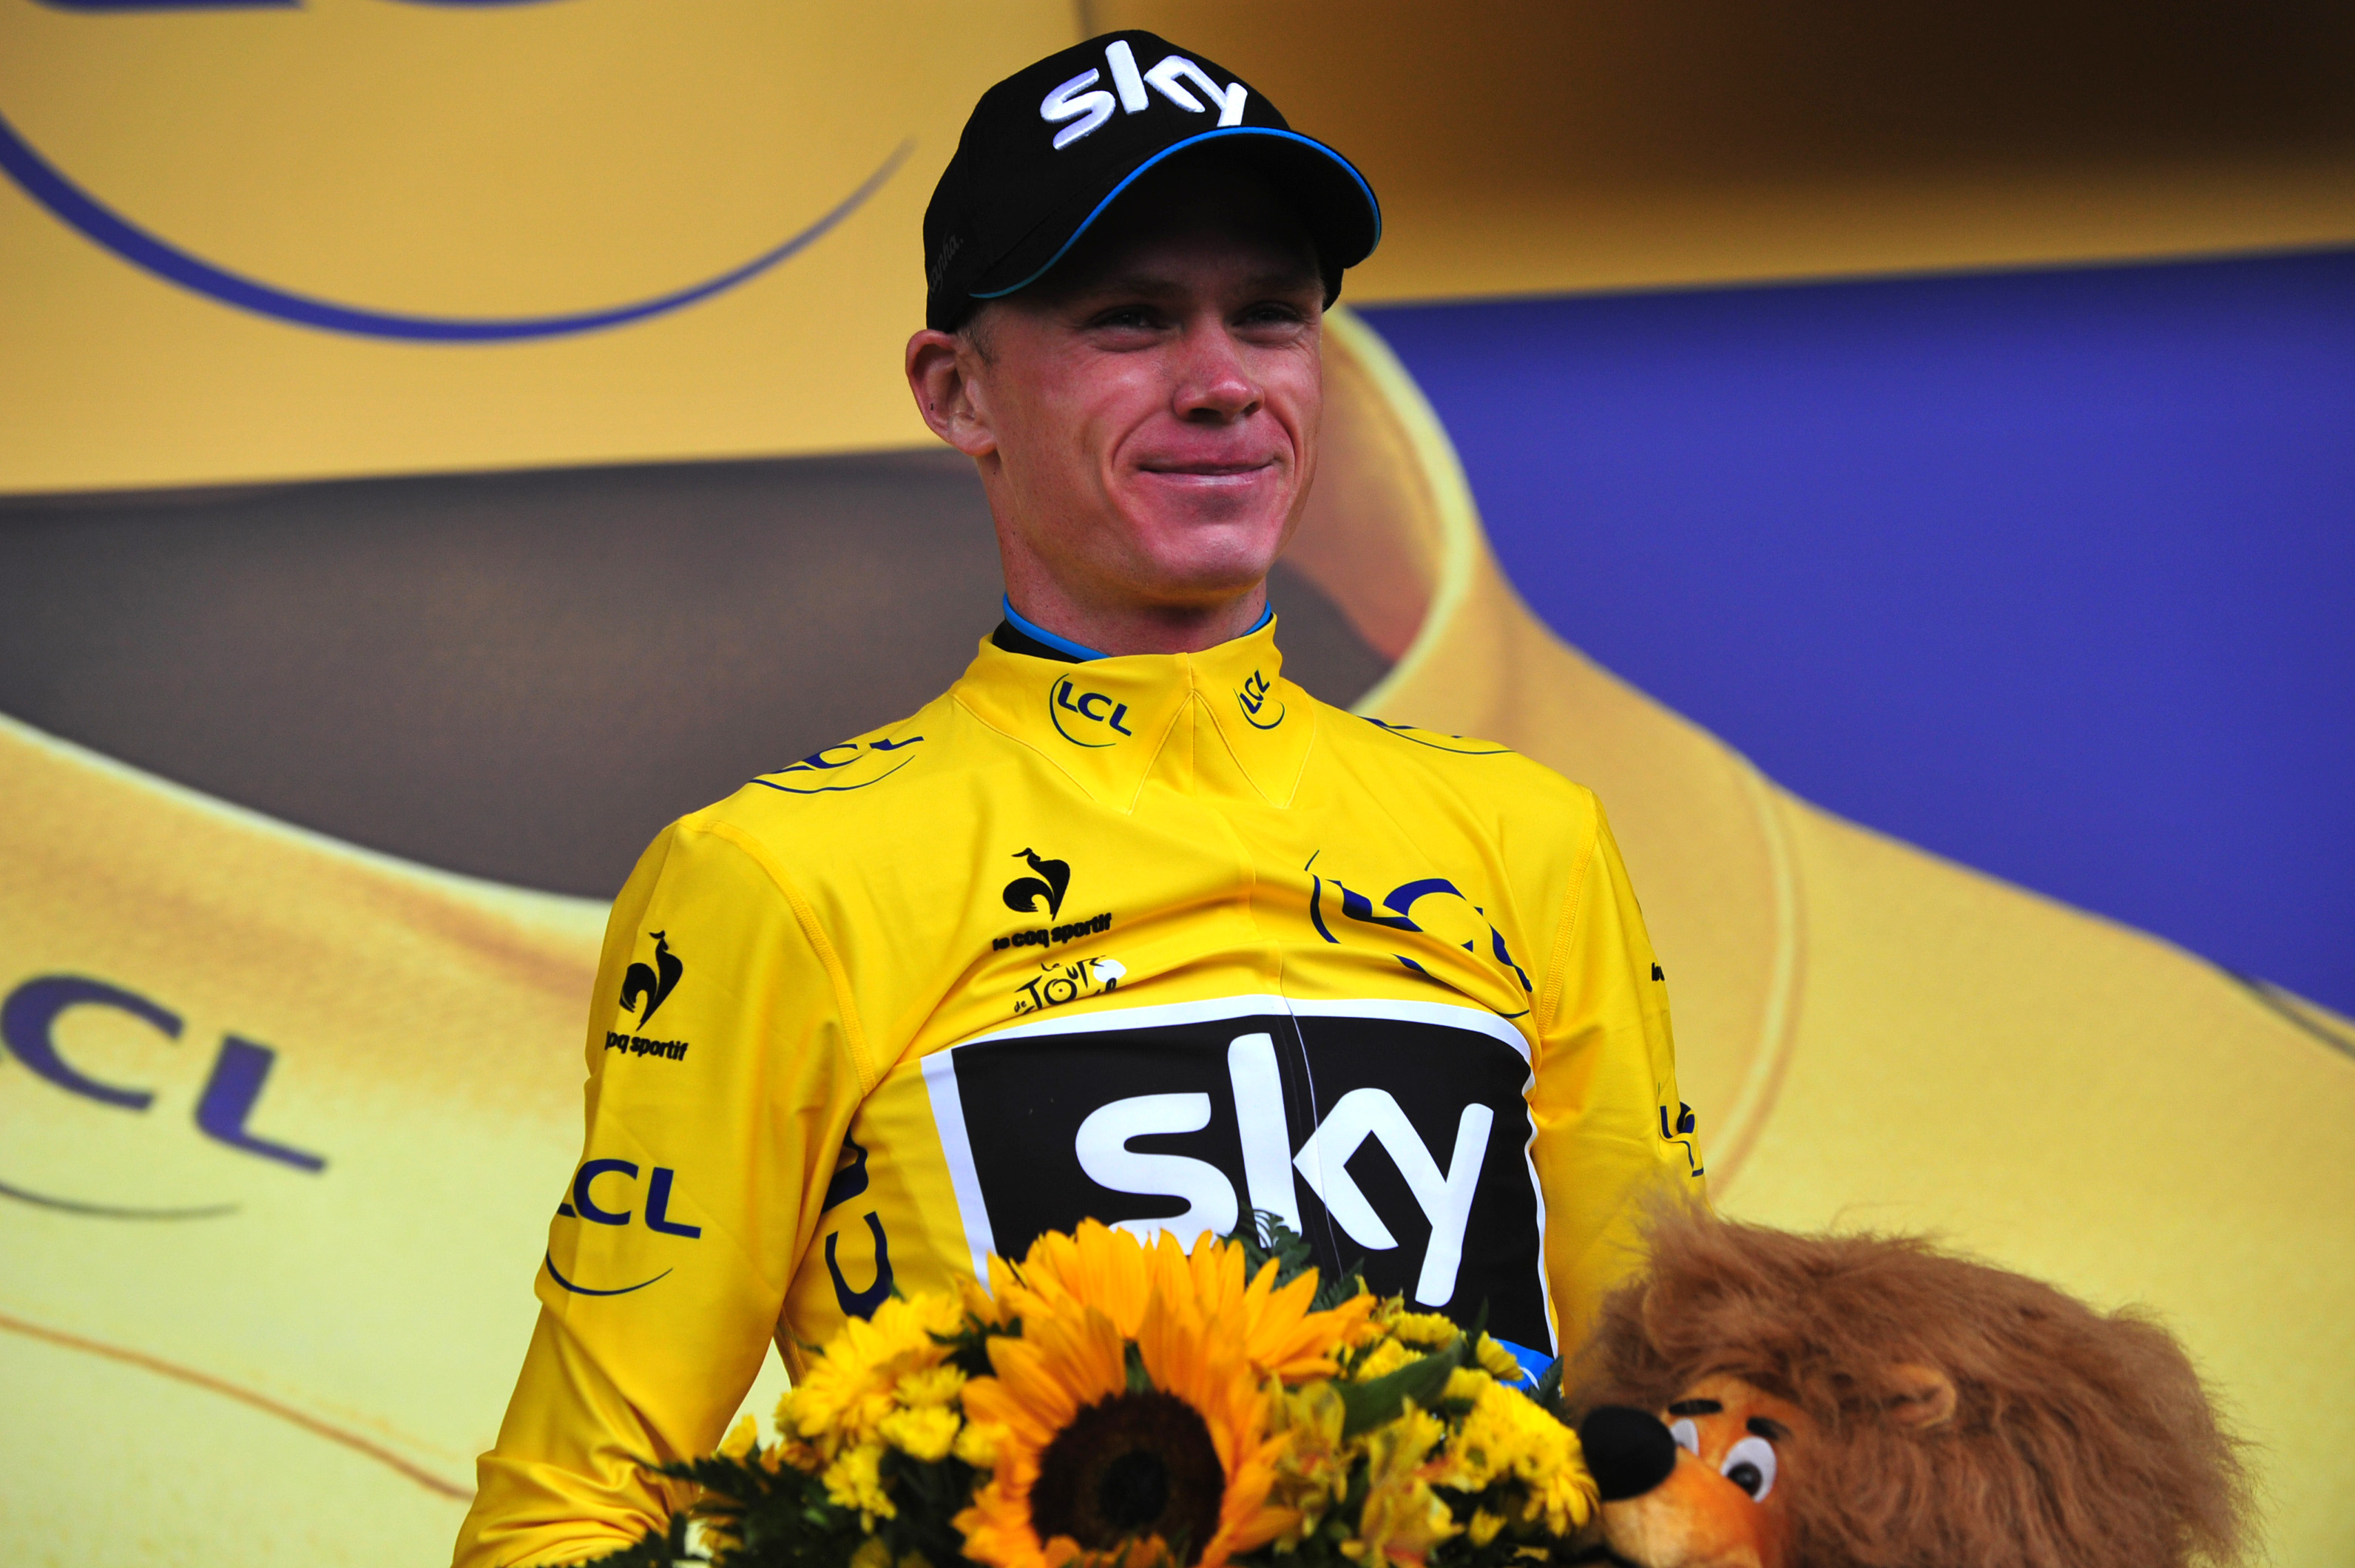 Tour de France 2015 - 12. Etappe - Chris Froome verteidigt sein Gelbes Trikot sicher. (pic: Sirotti)